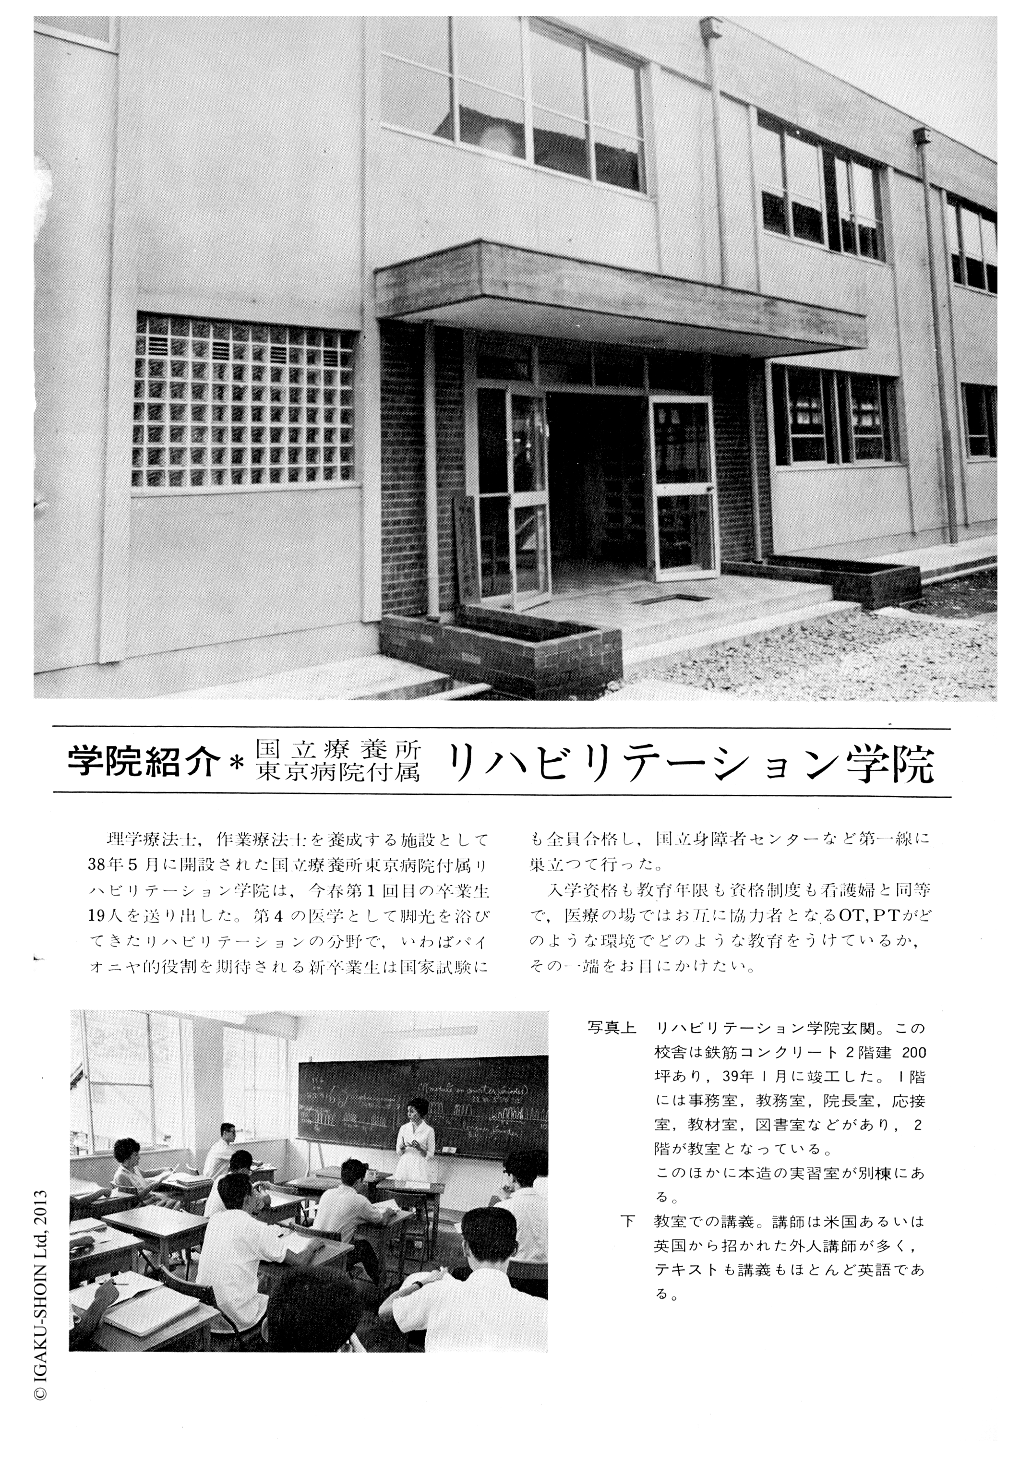 病院 東京 病院 機構 国立